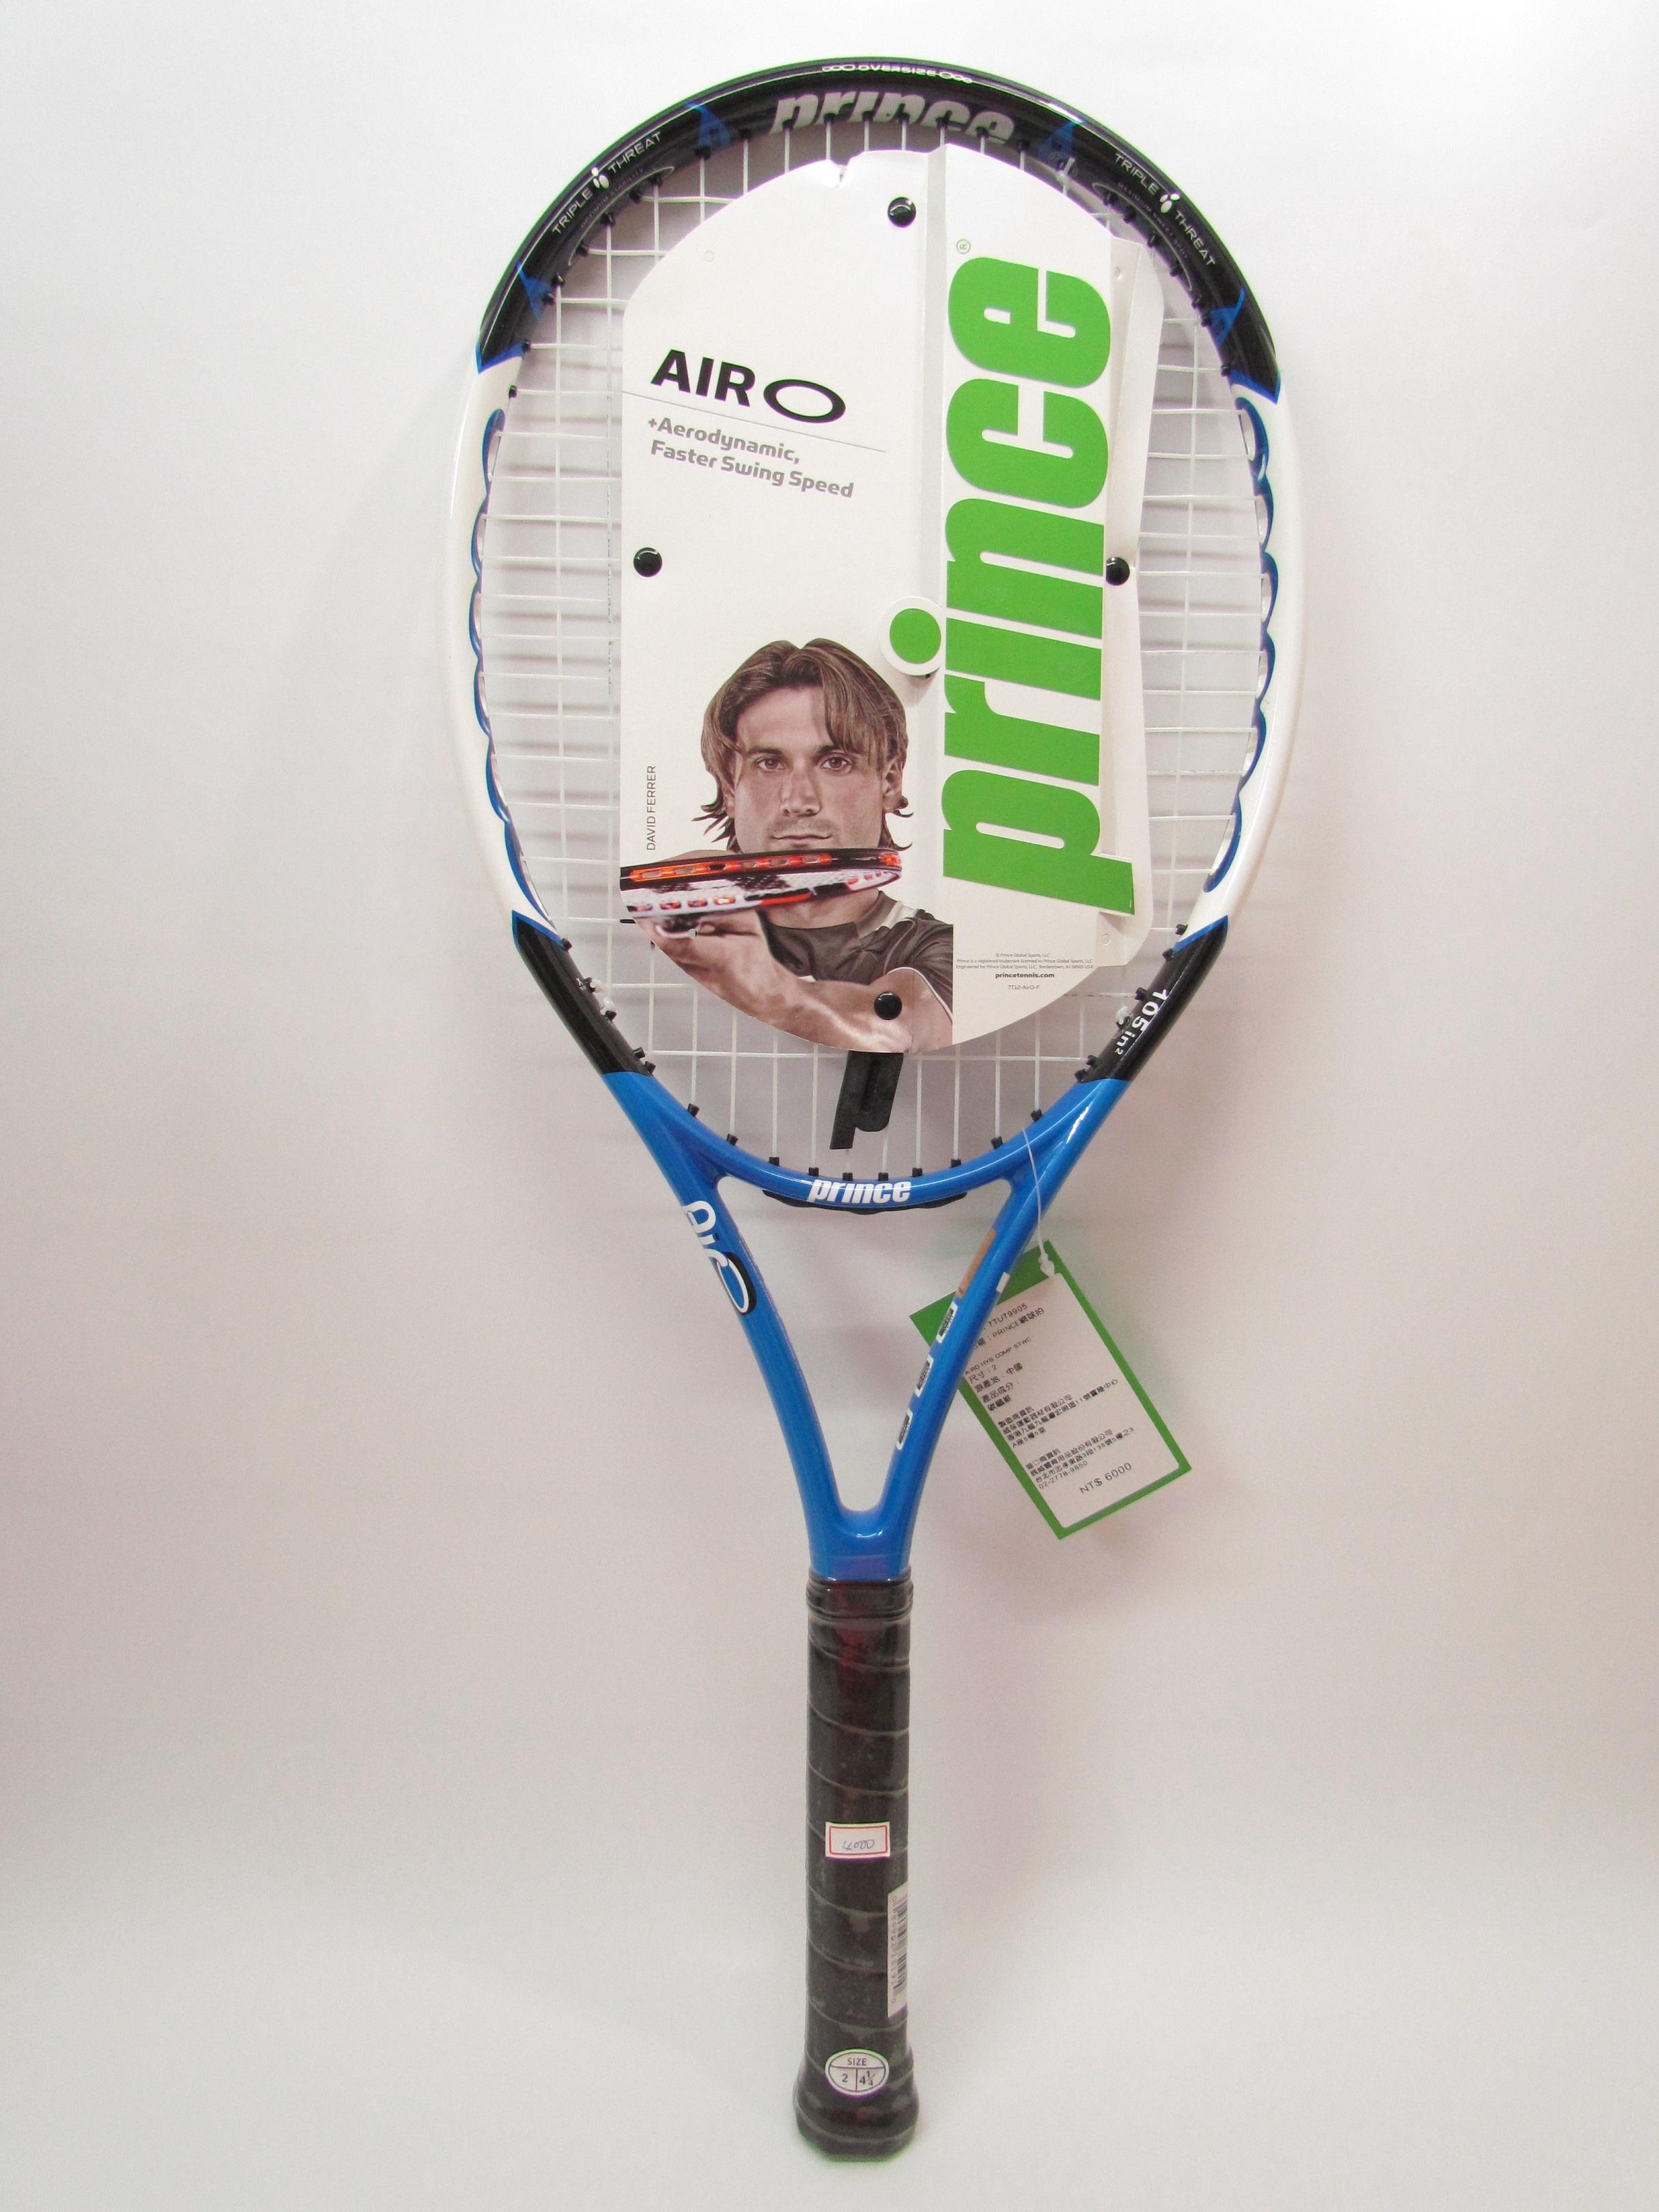 Prince專業網球拍 AirO Hybrid Comp